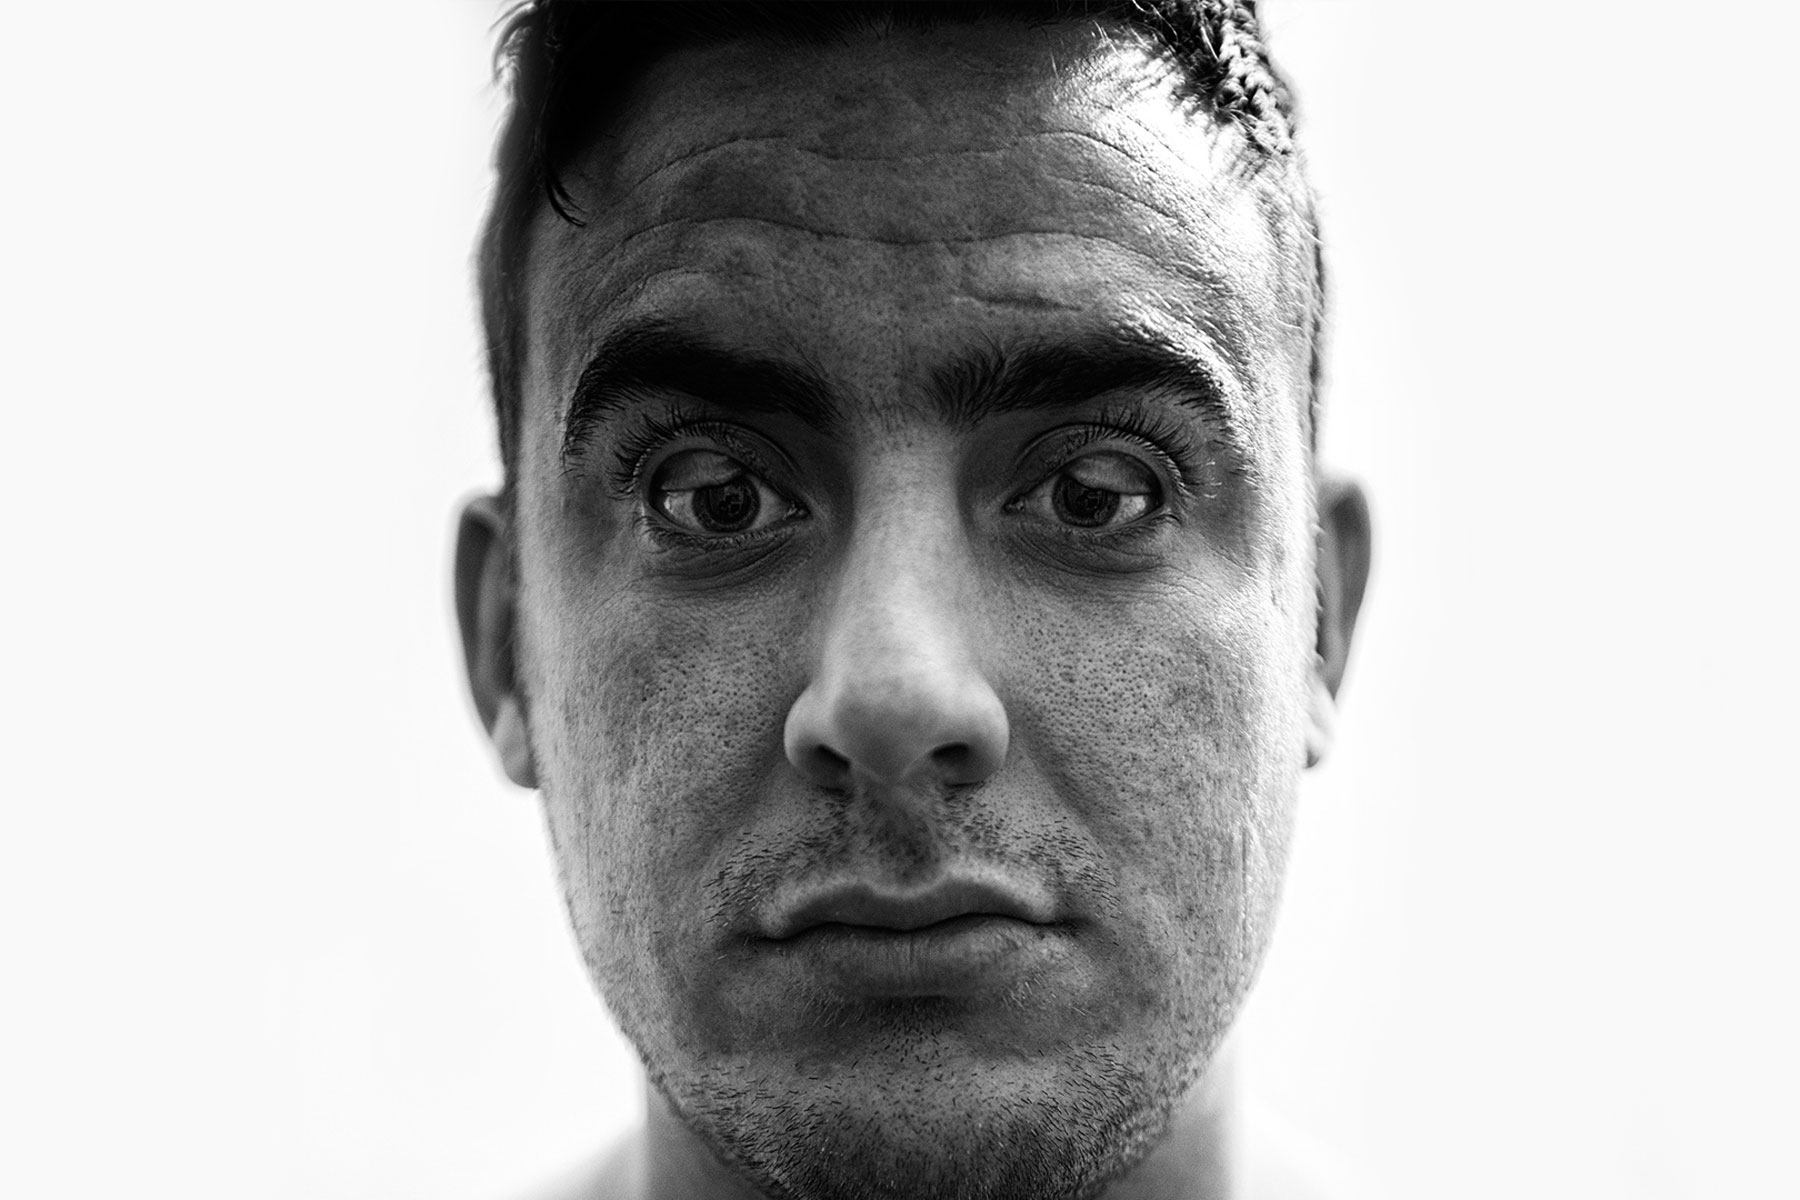 eyelids-portrait-skin-bad.jpg